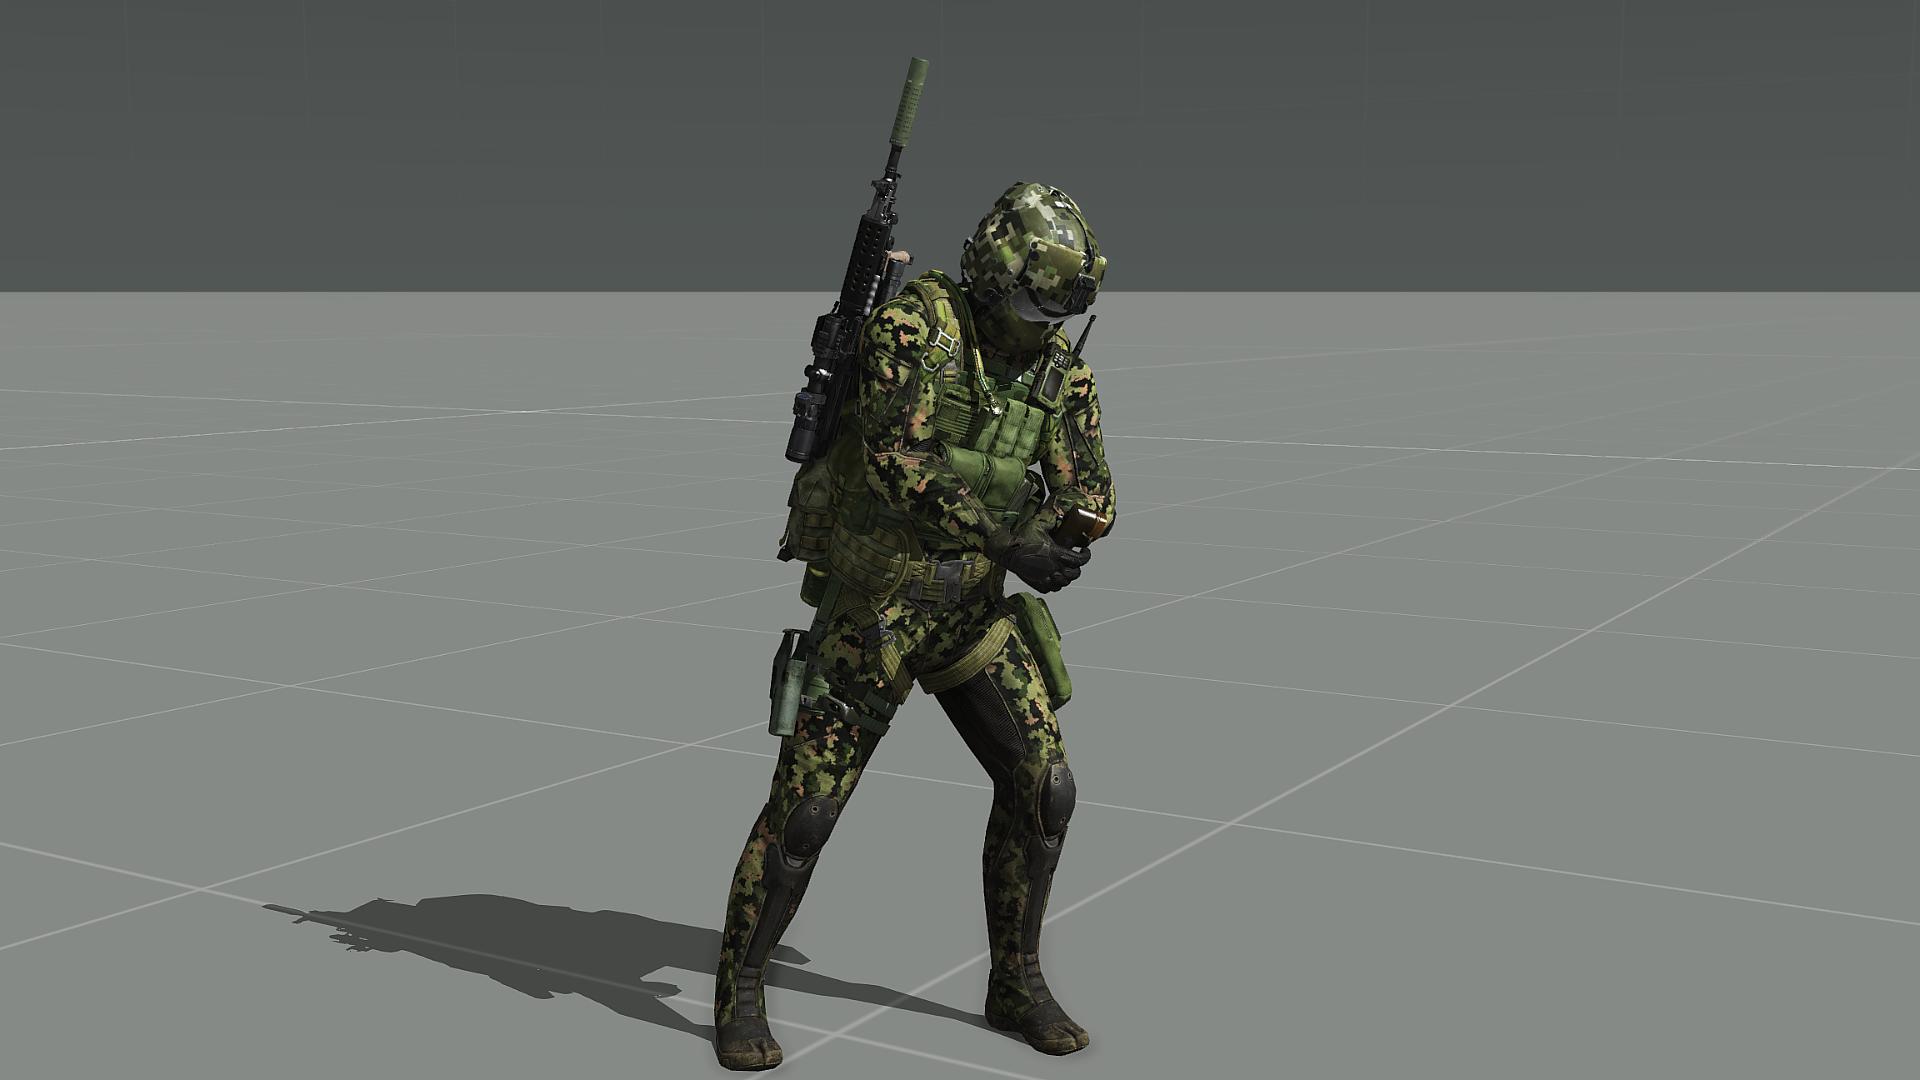 ArmA 3 Screenshot 2020.04.27 - 17.20.52.19.png